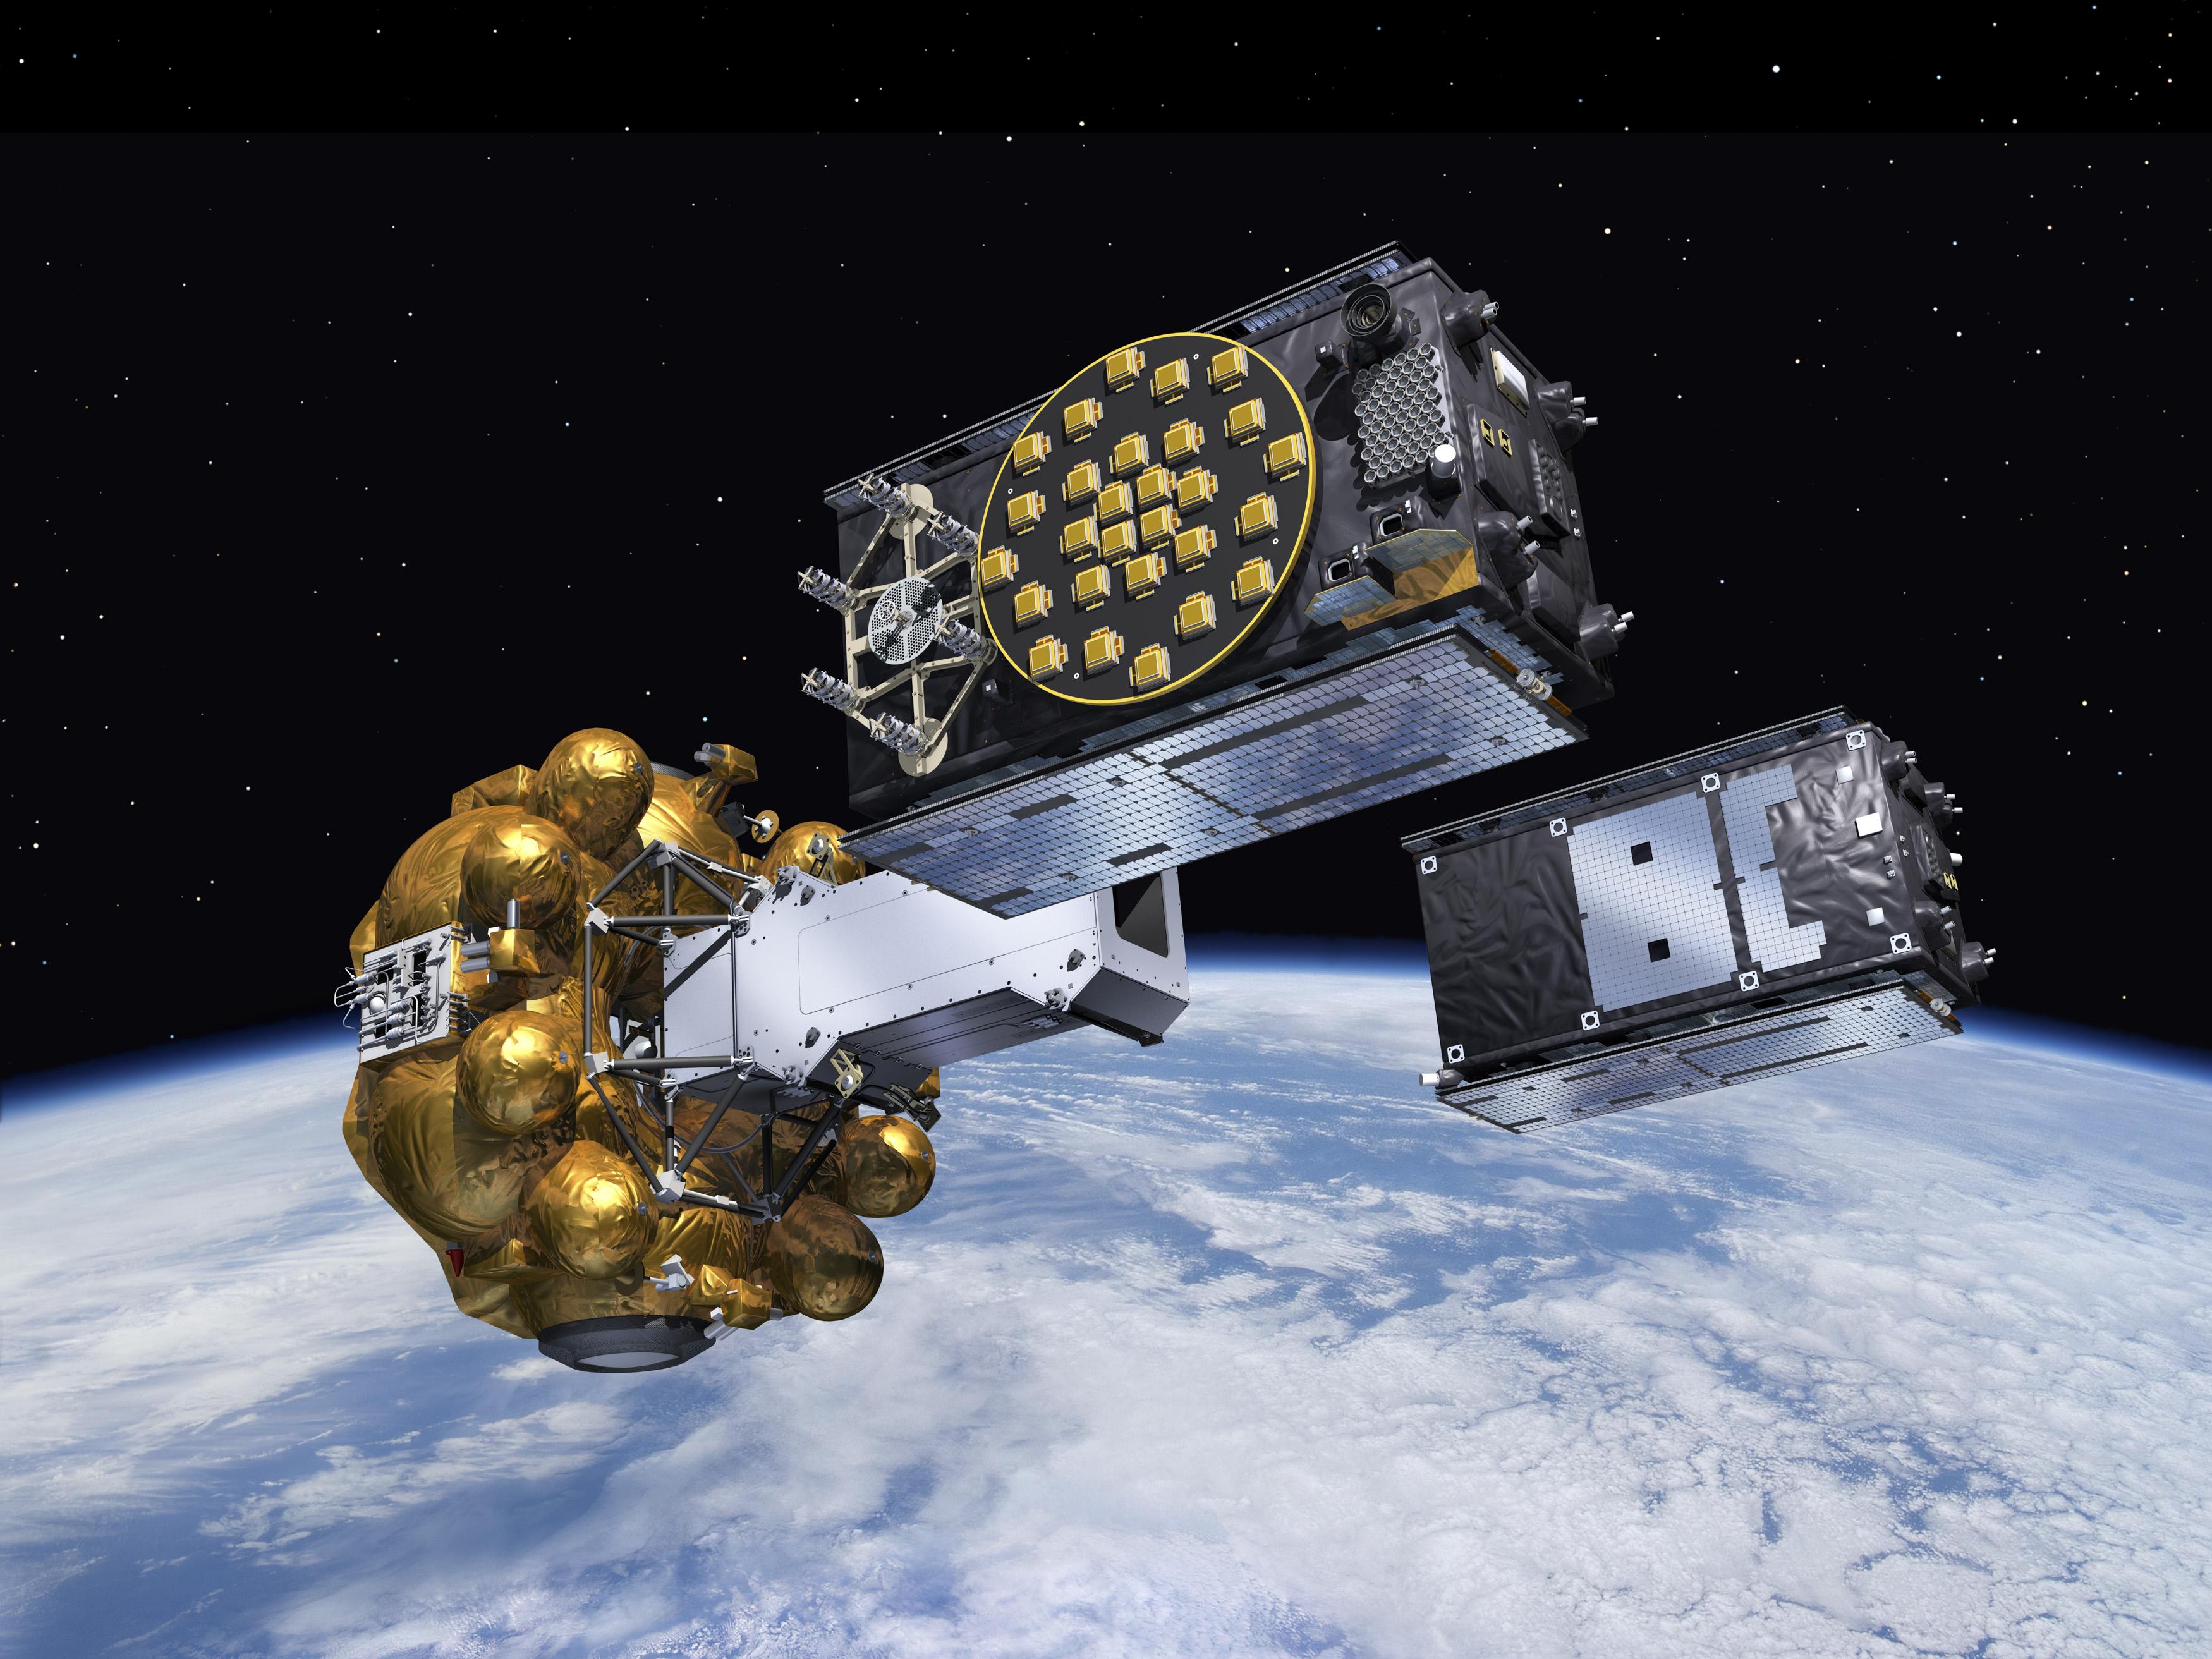 Artist's view of Galileo Sat 5&6